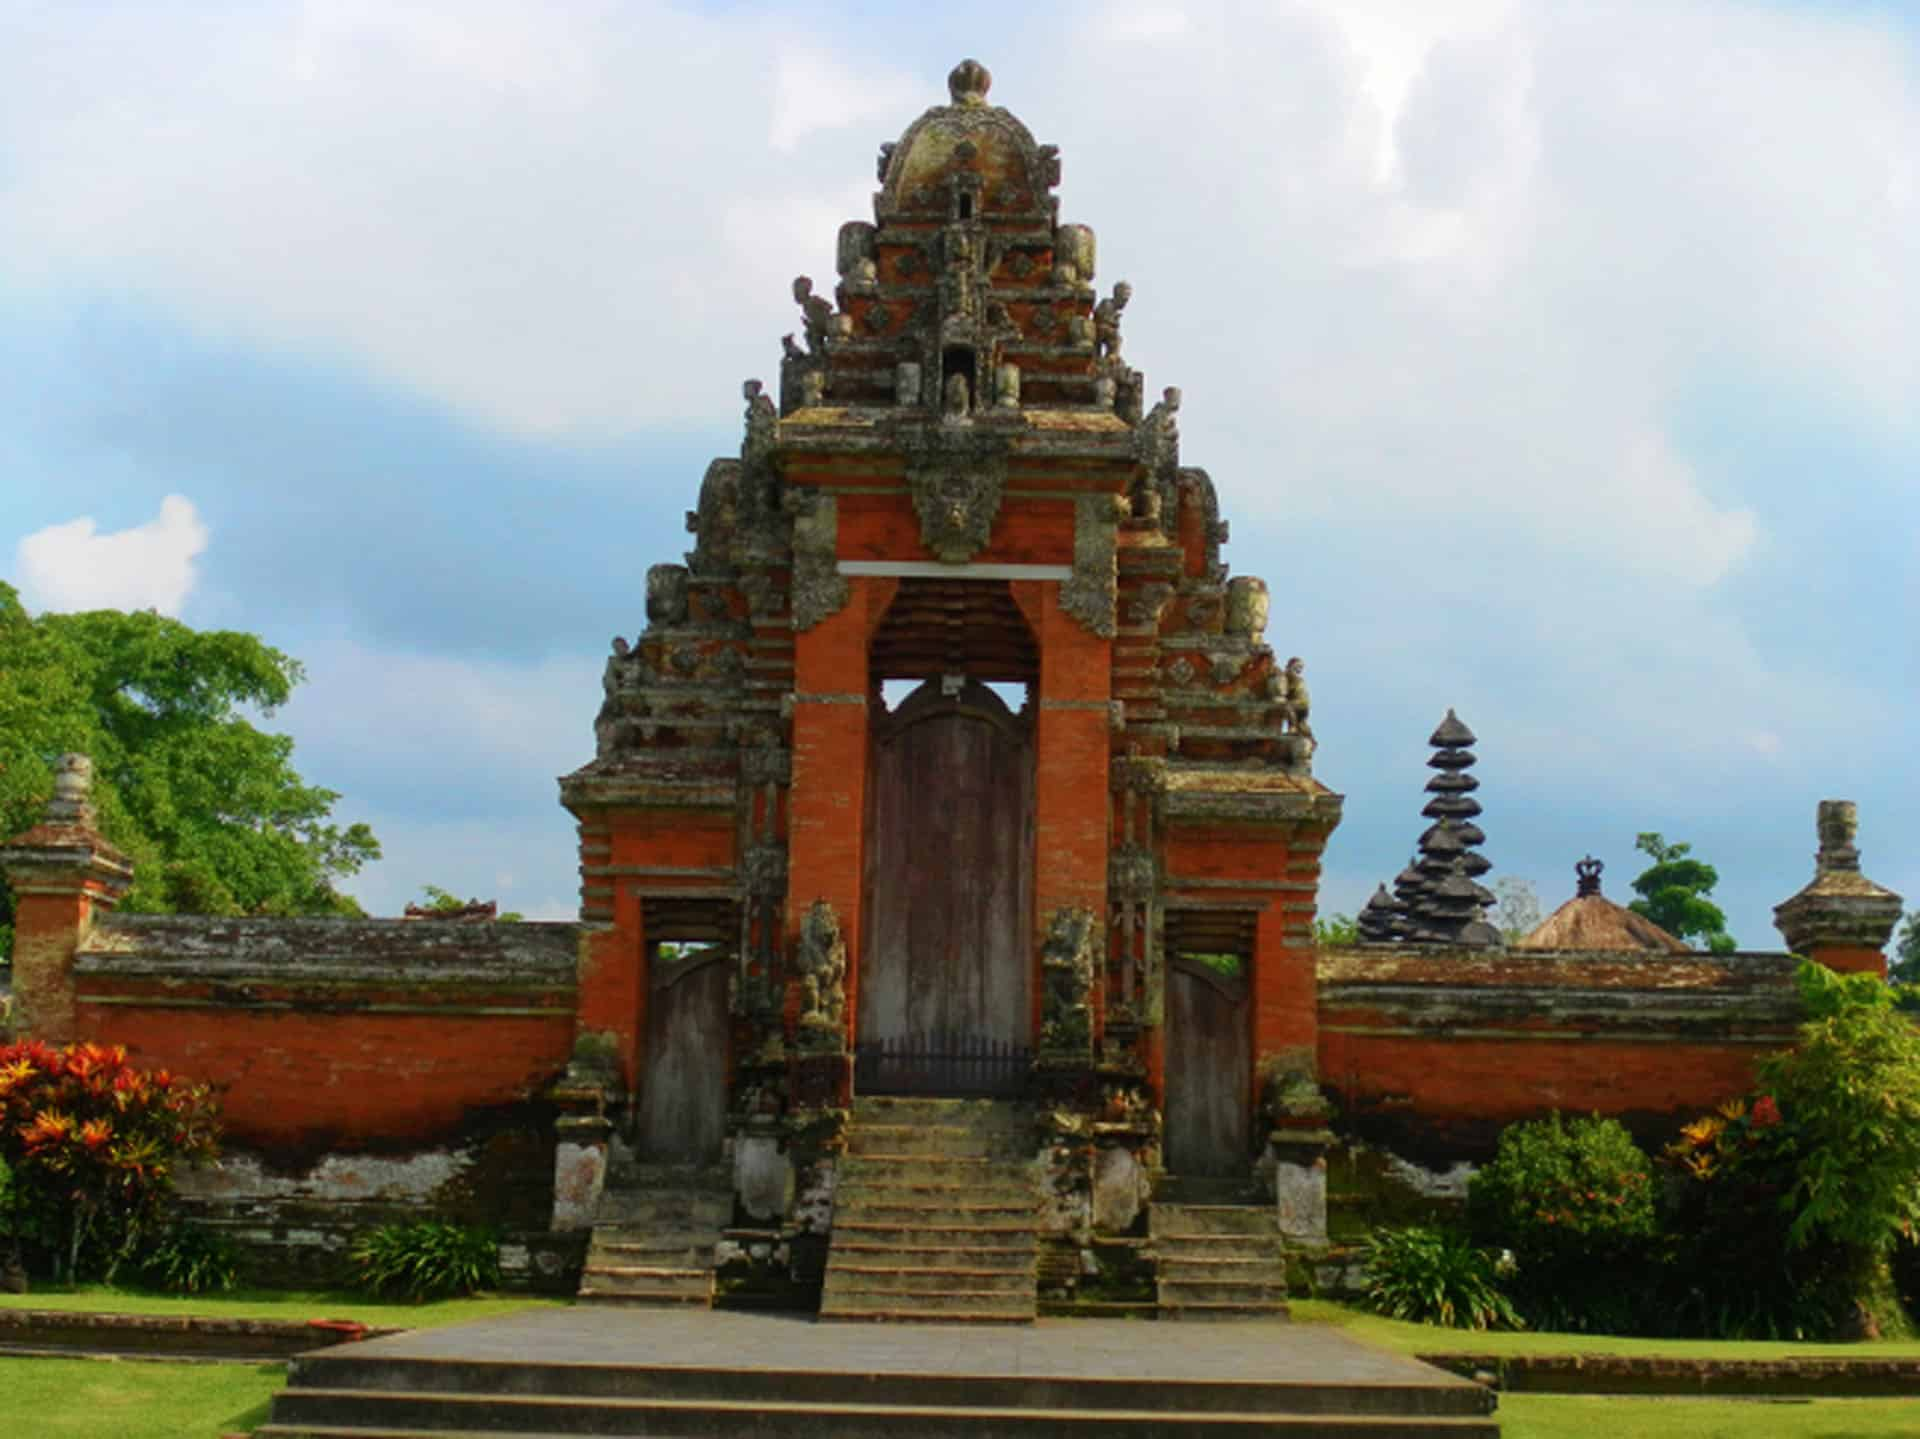 mengwi's royal temple bali